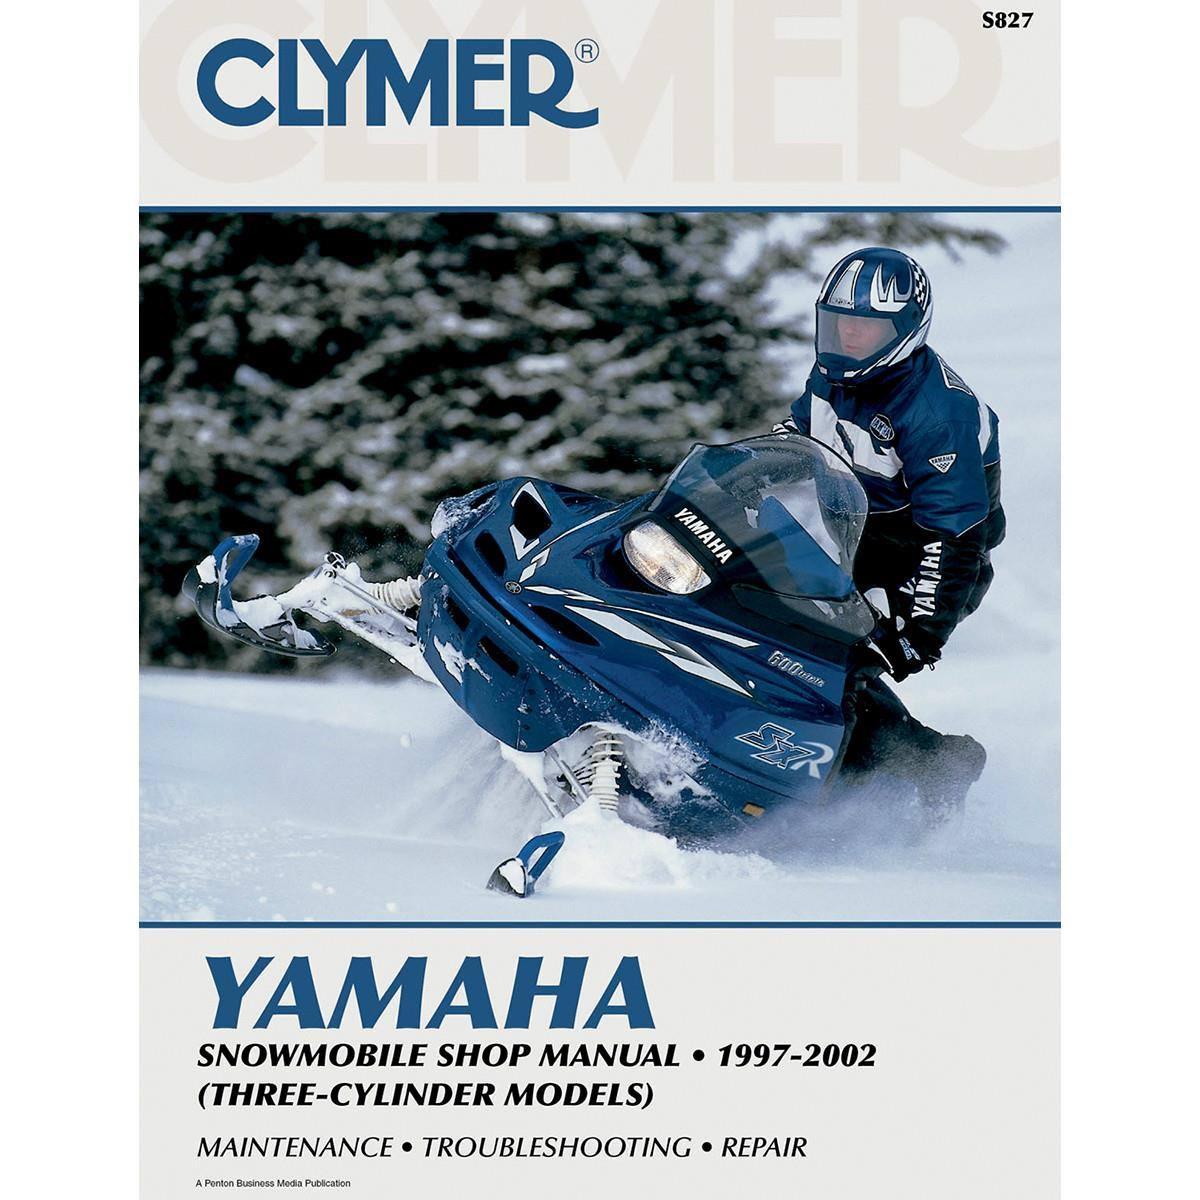 Repair Manual for sale in Indianapolis, IN   Dreyer Motorsports (877)  413-8881